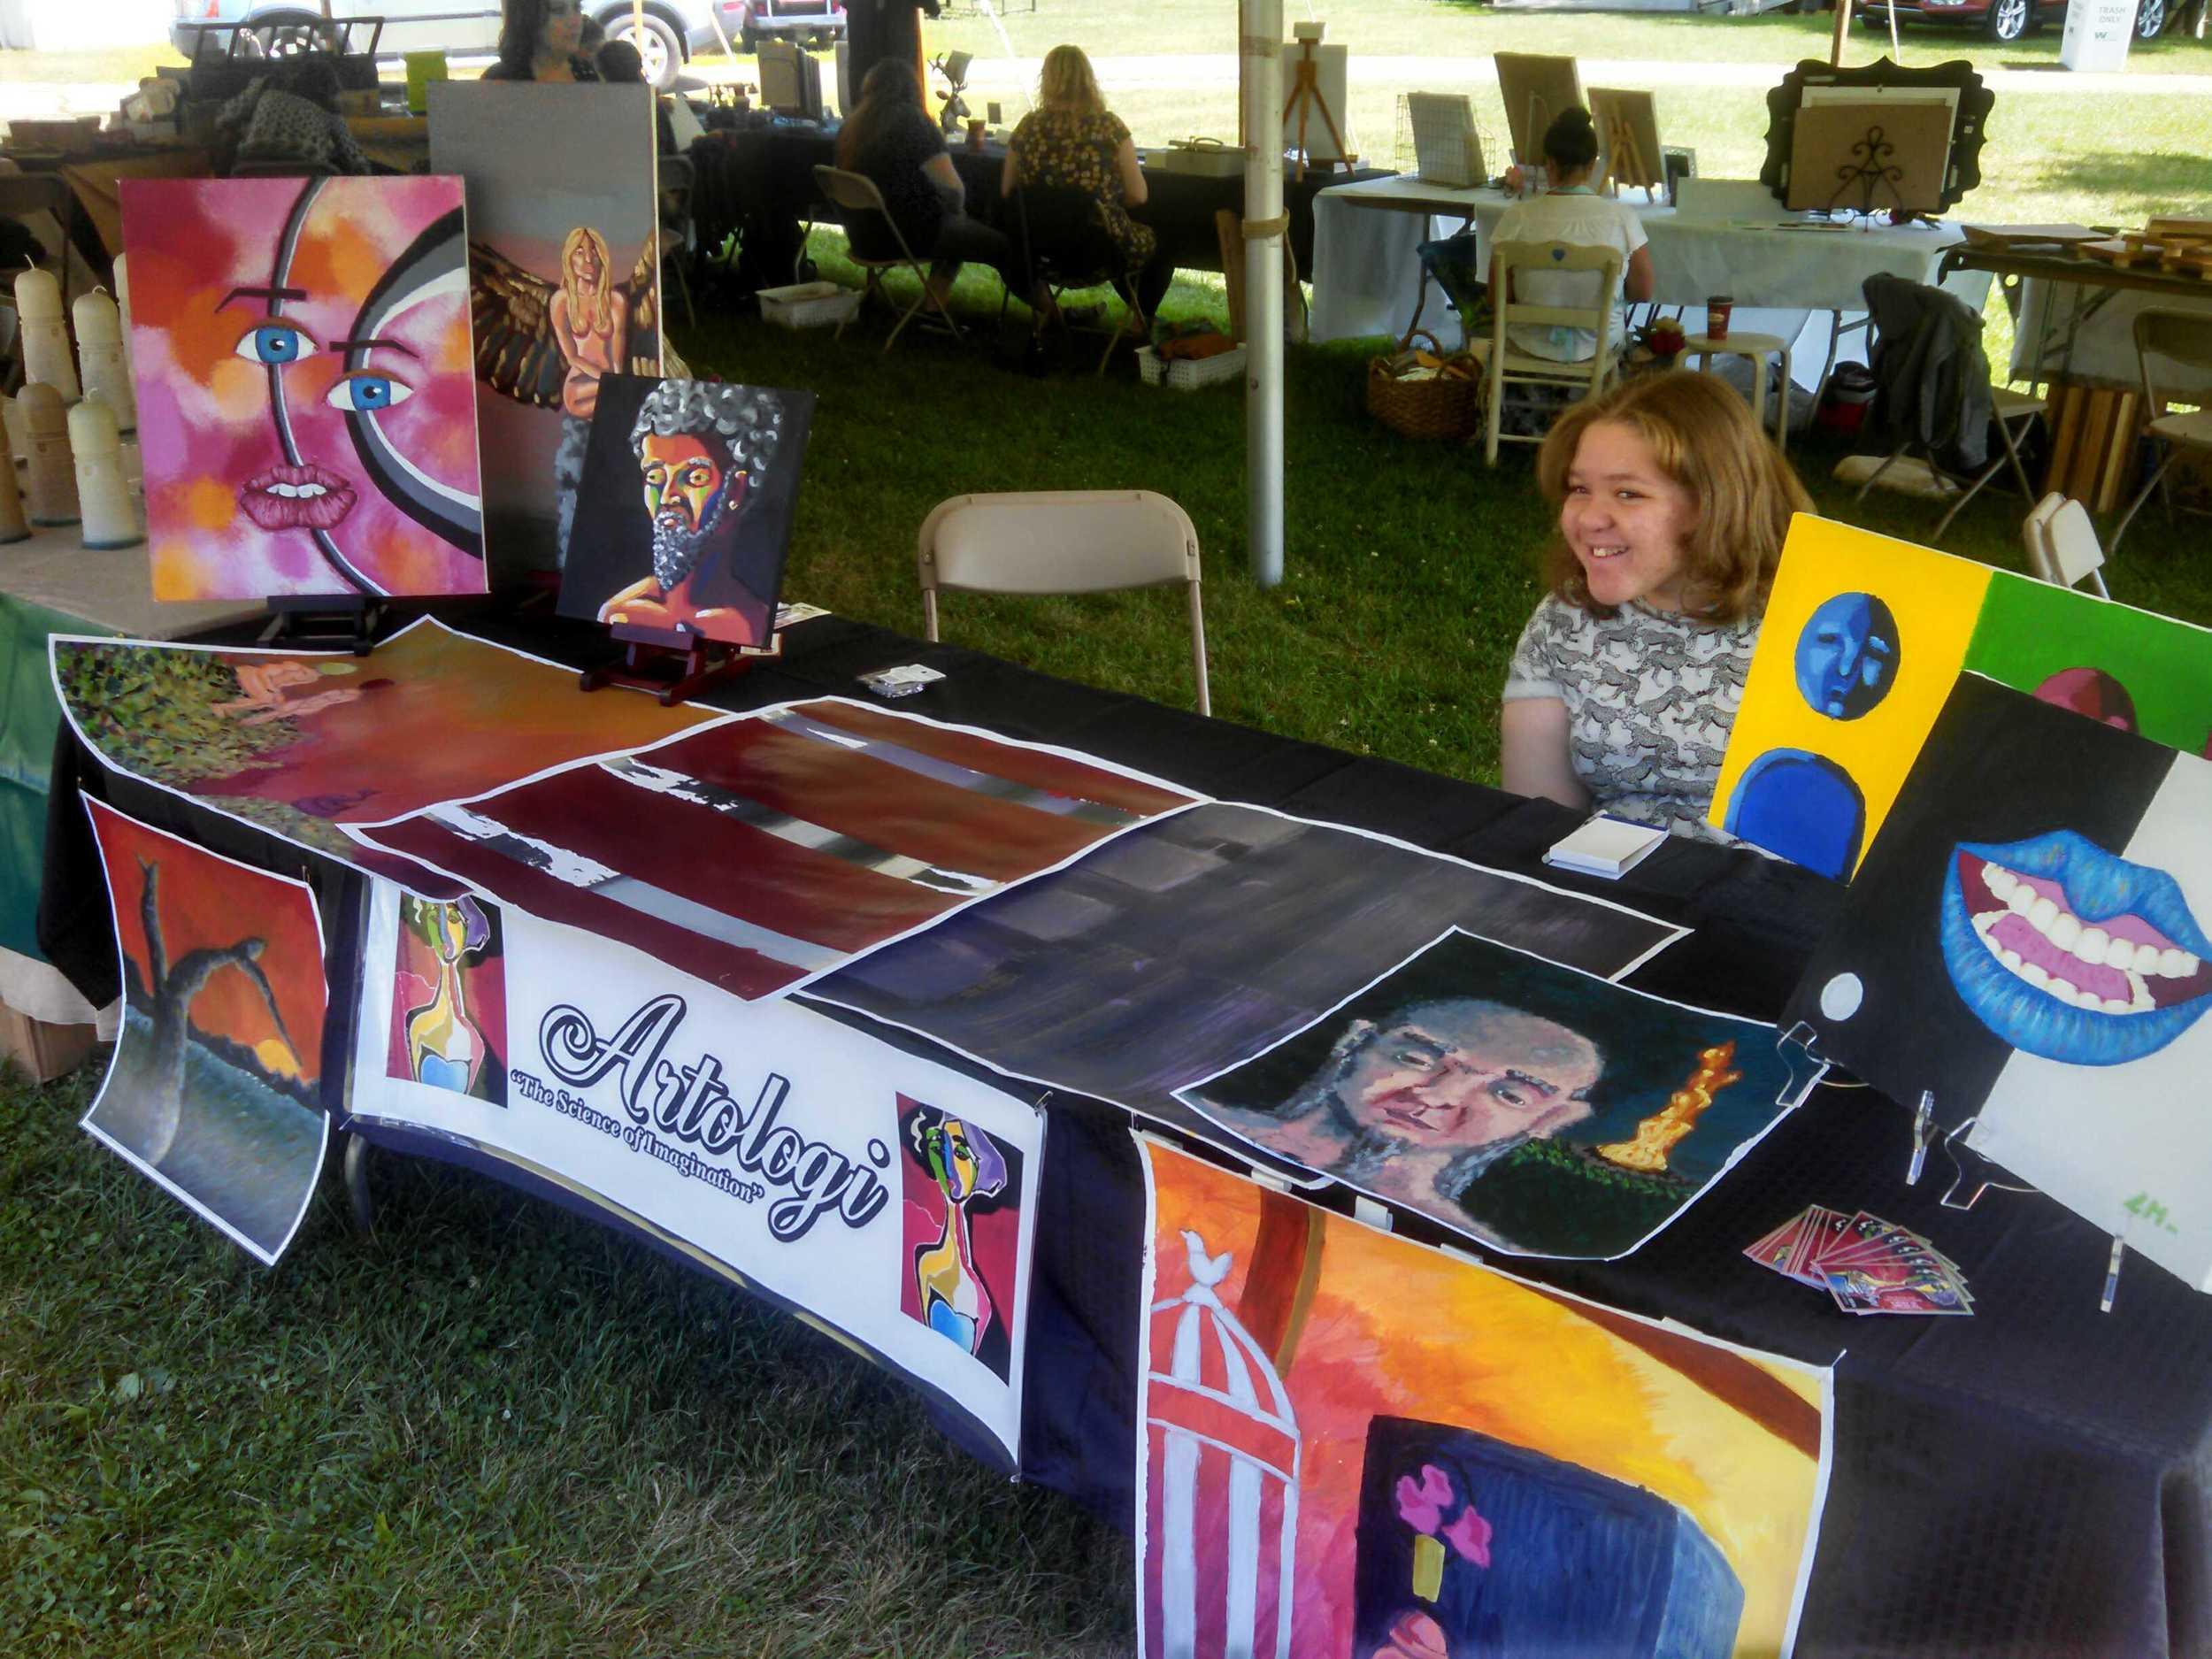 Lauren selling her artwork at a local fair through her business, Artologi.